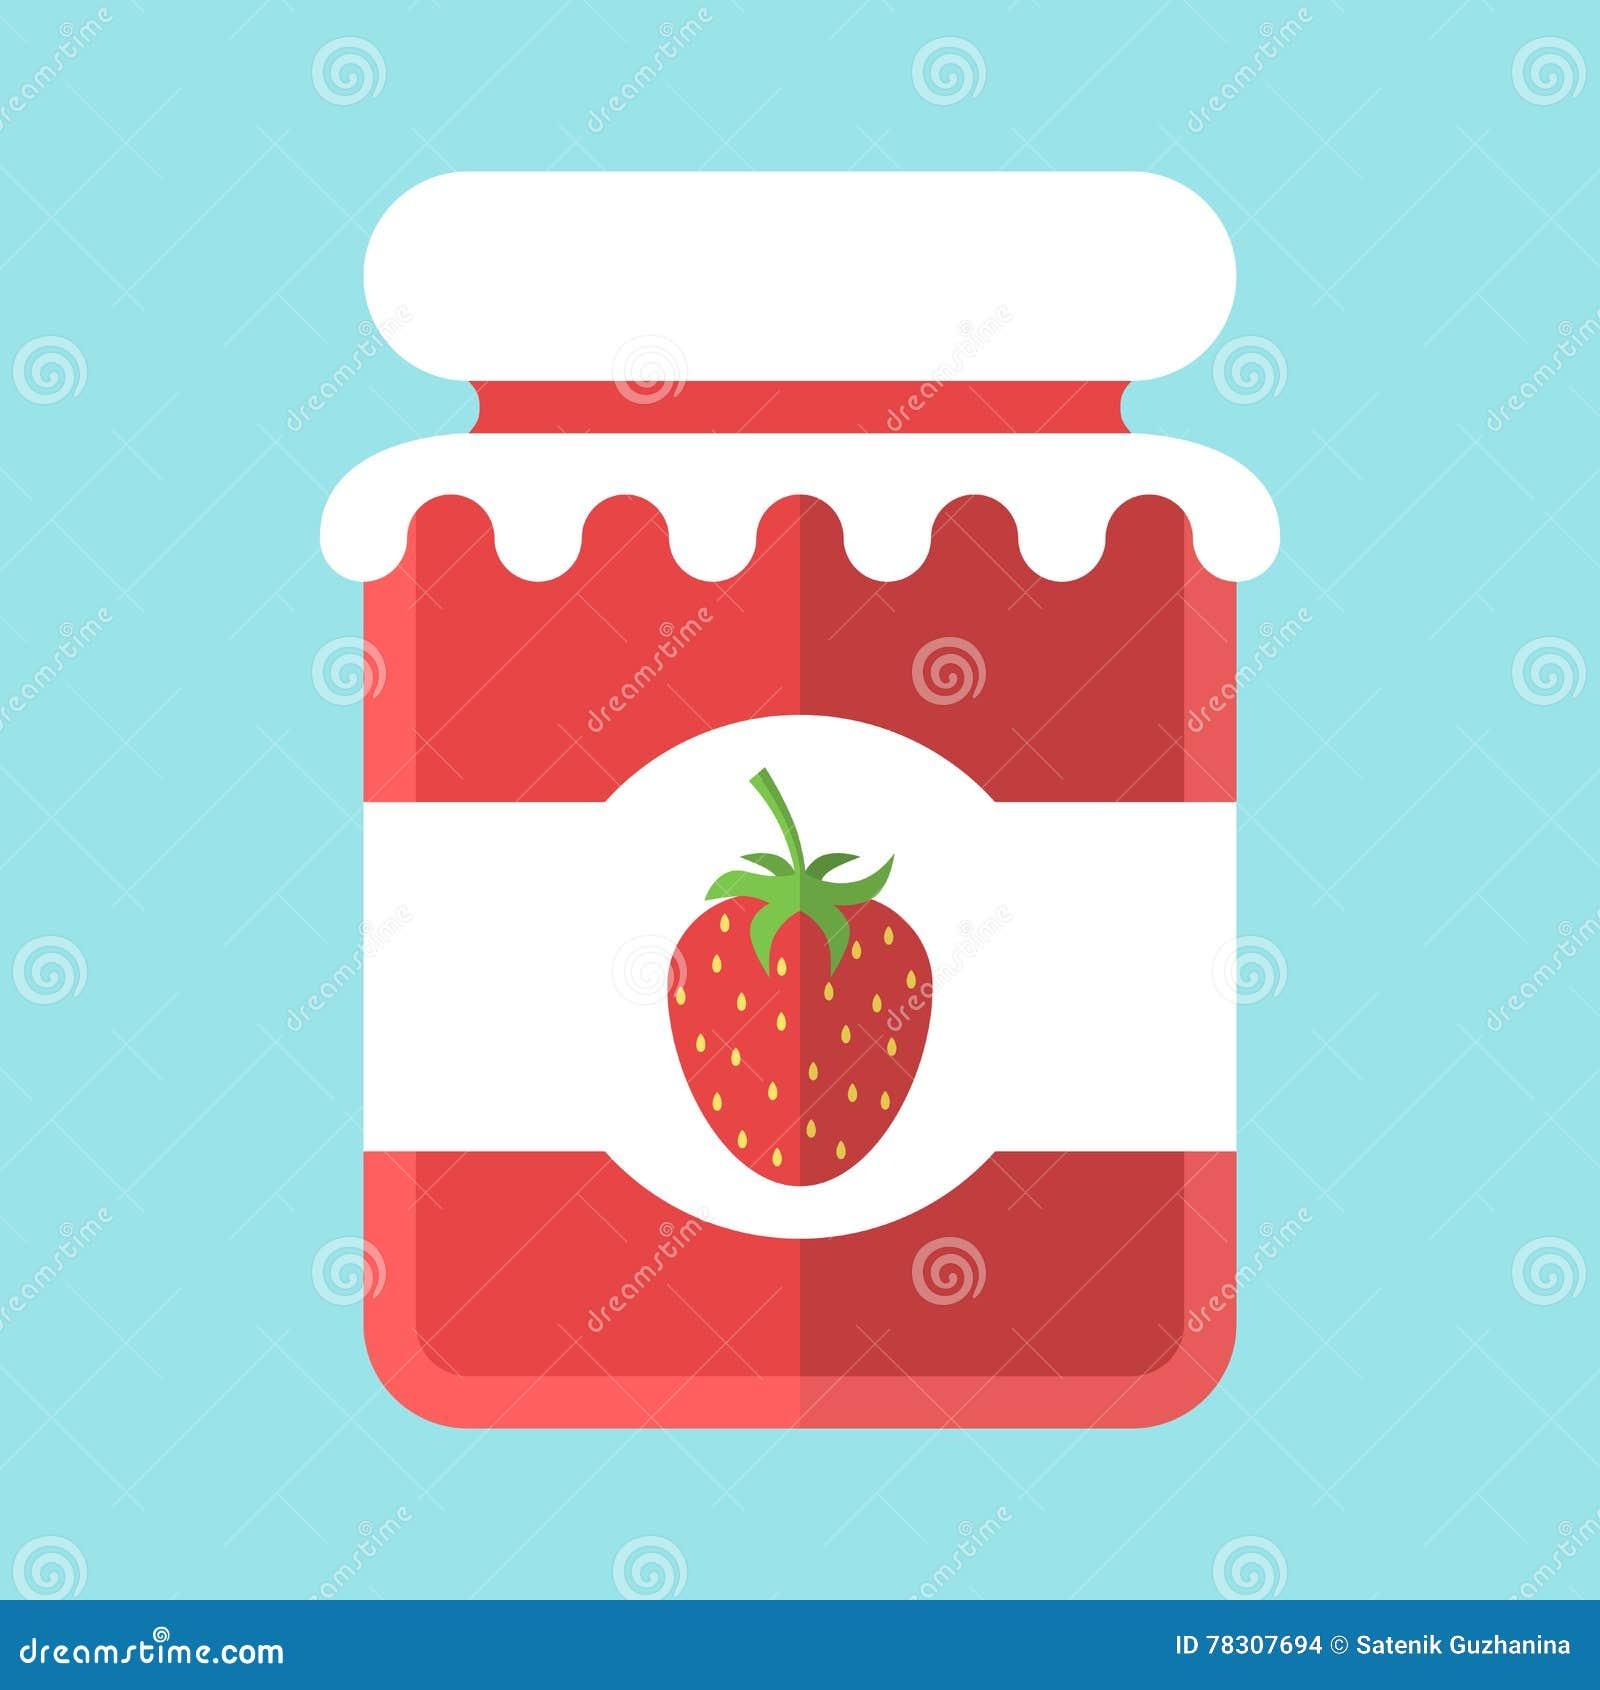 Glass Strawberry Jam Jar Stock Vector Illustration Of Delicious